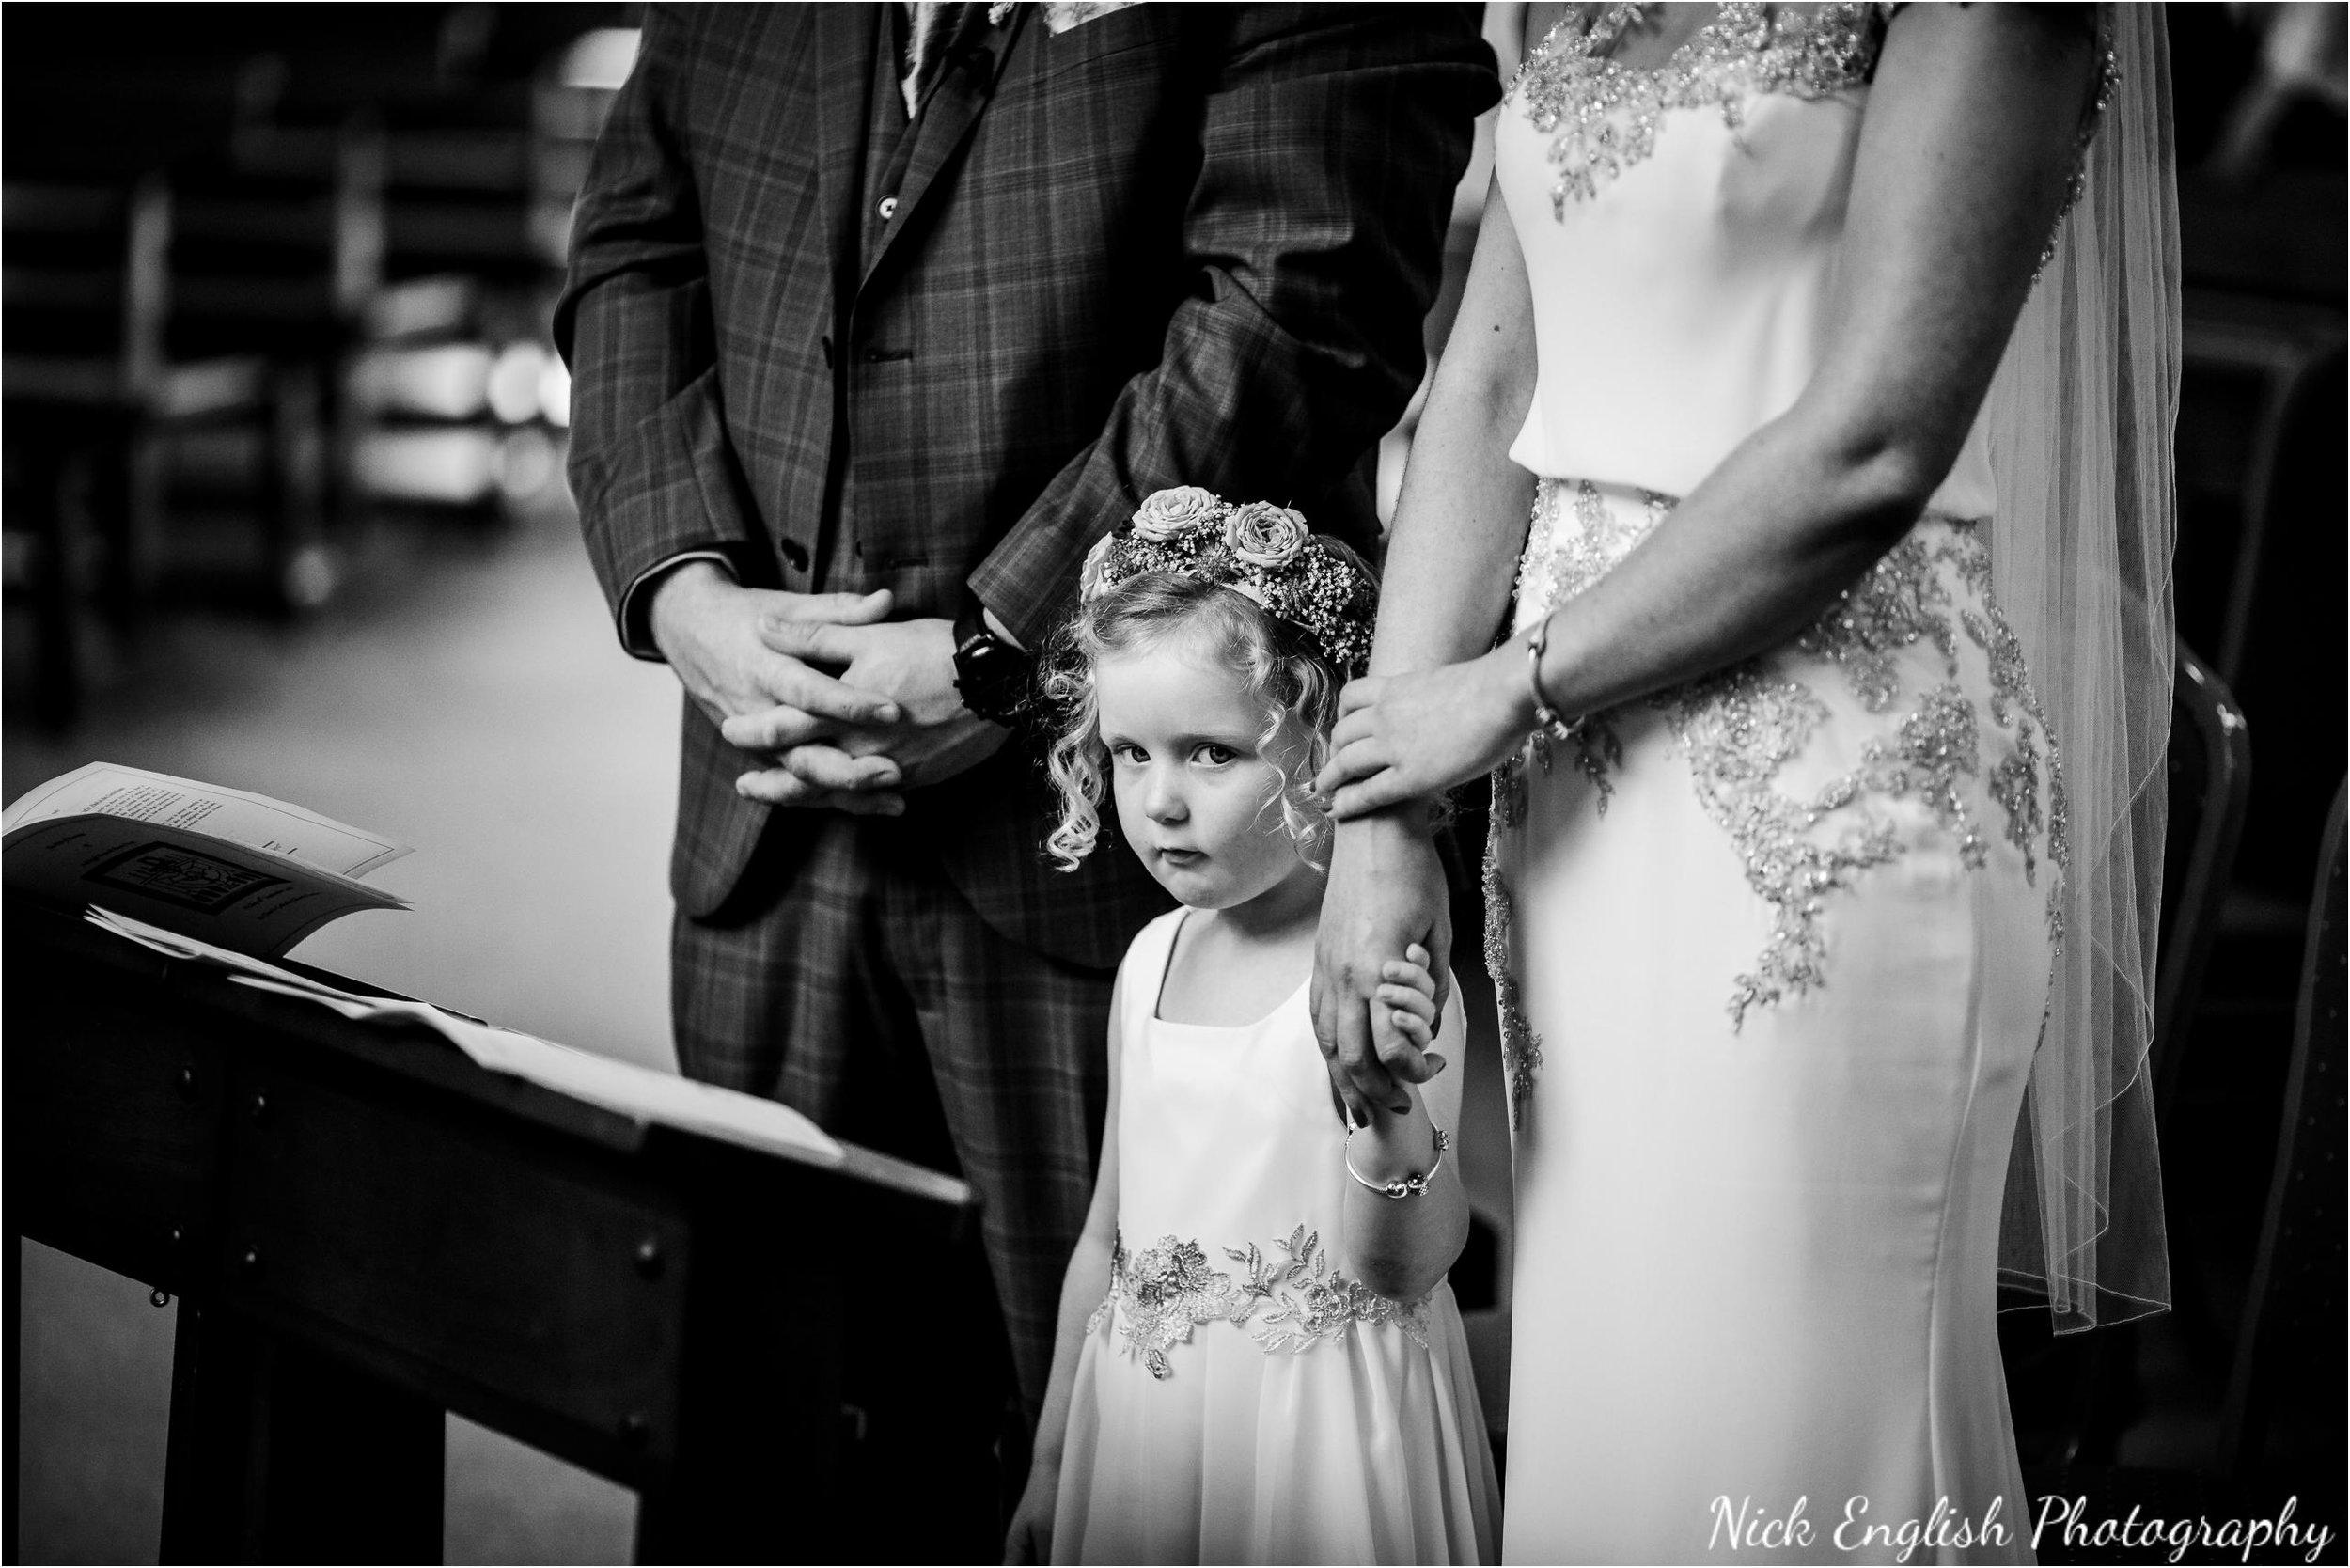 Stacey-Ash-Wedding-Photographs-Stanley-House-Preston-Lancashire-52.jpg